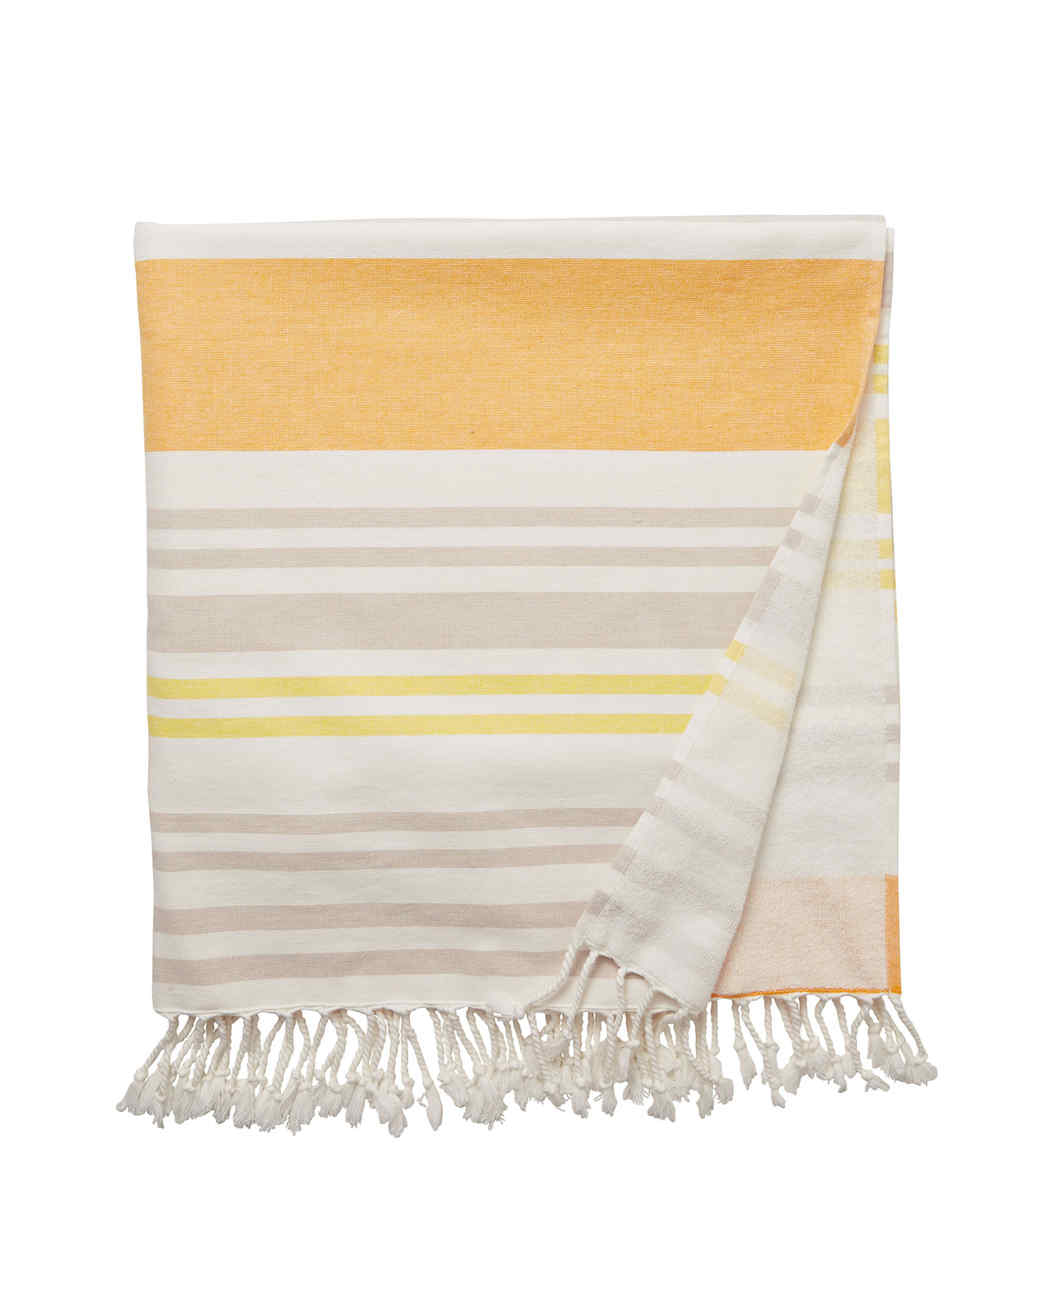 editors-picks-0816-sutro-strip-beach-towel-169-d113014_l.jpg